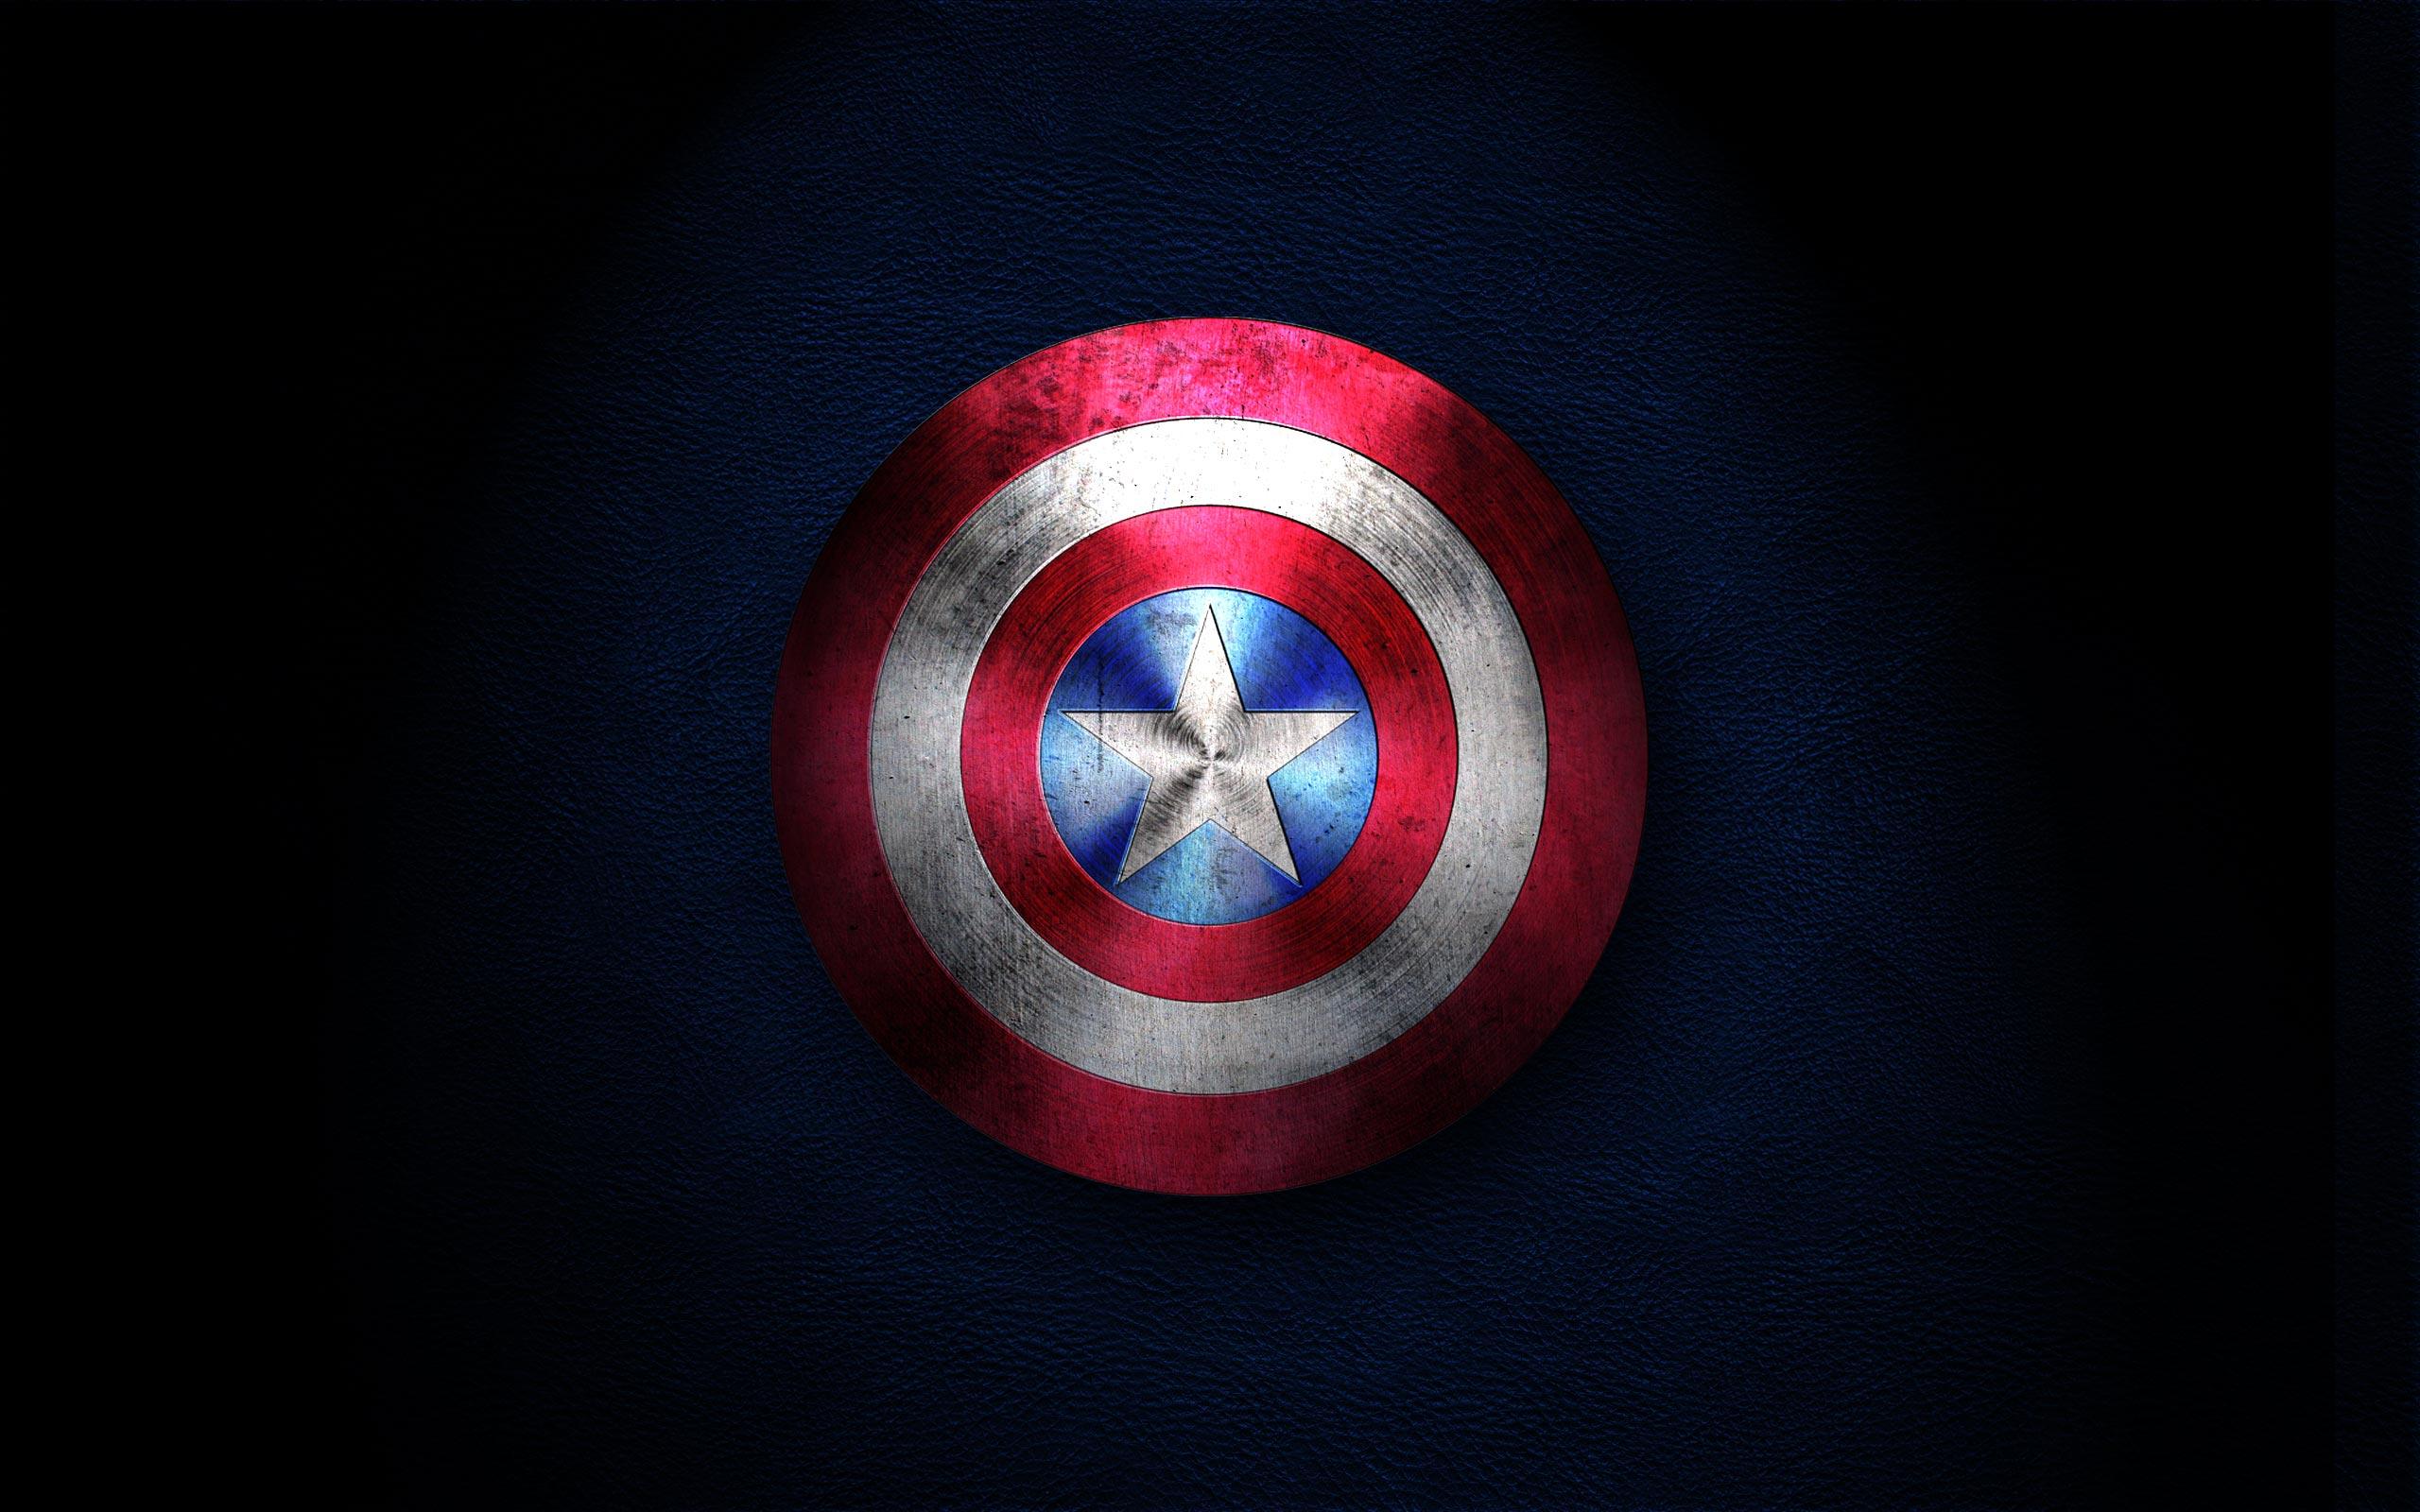 Captain-America-Shield-Widescreen-Wallpaper-WallpapersHunt.com-